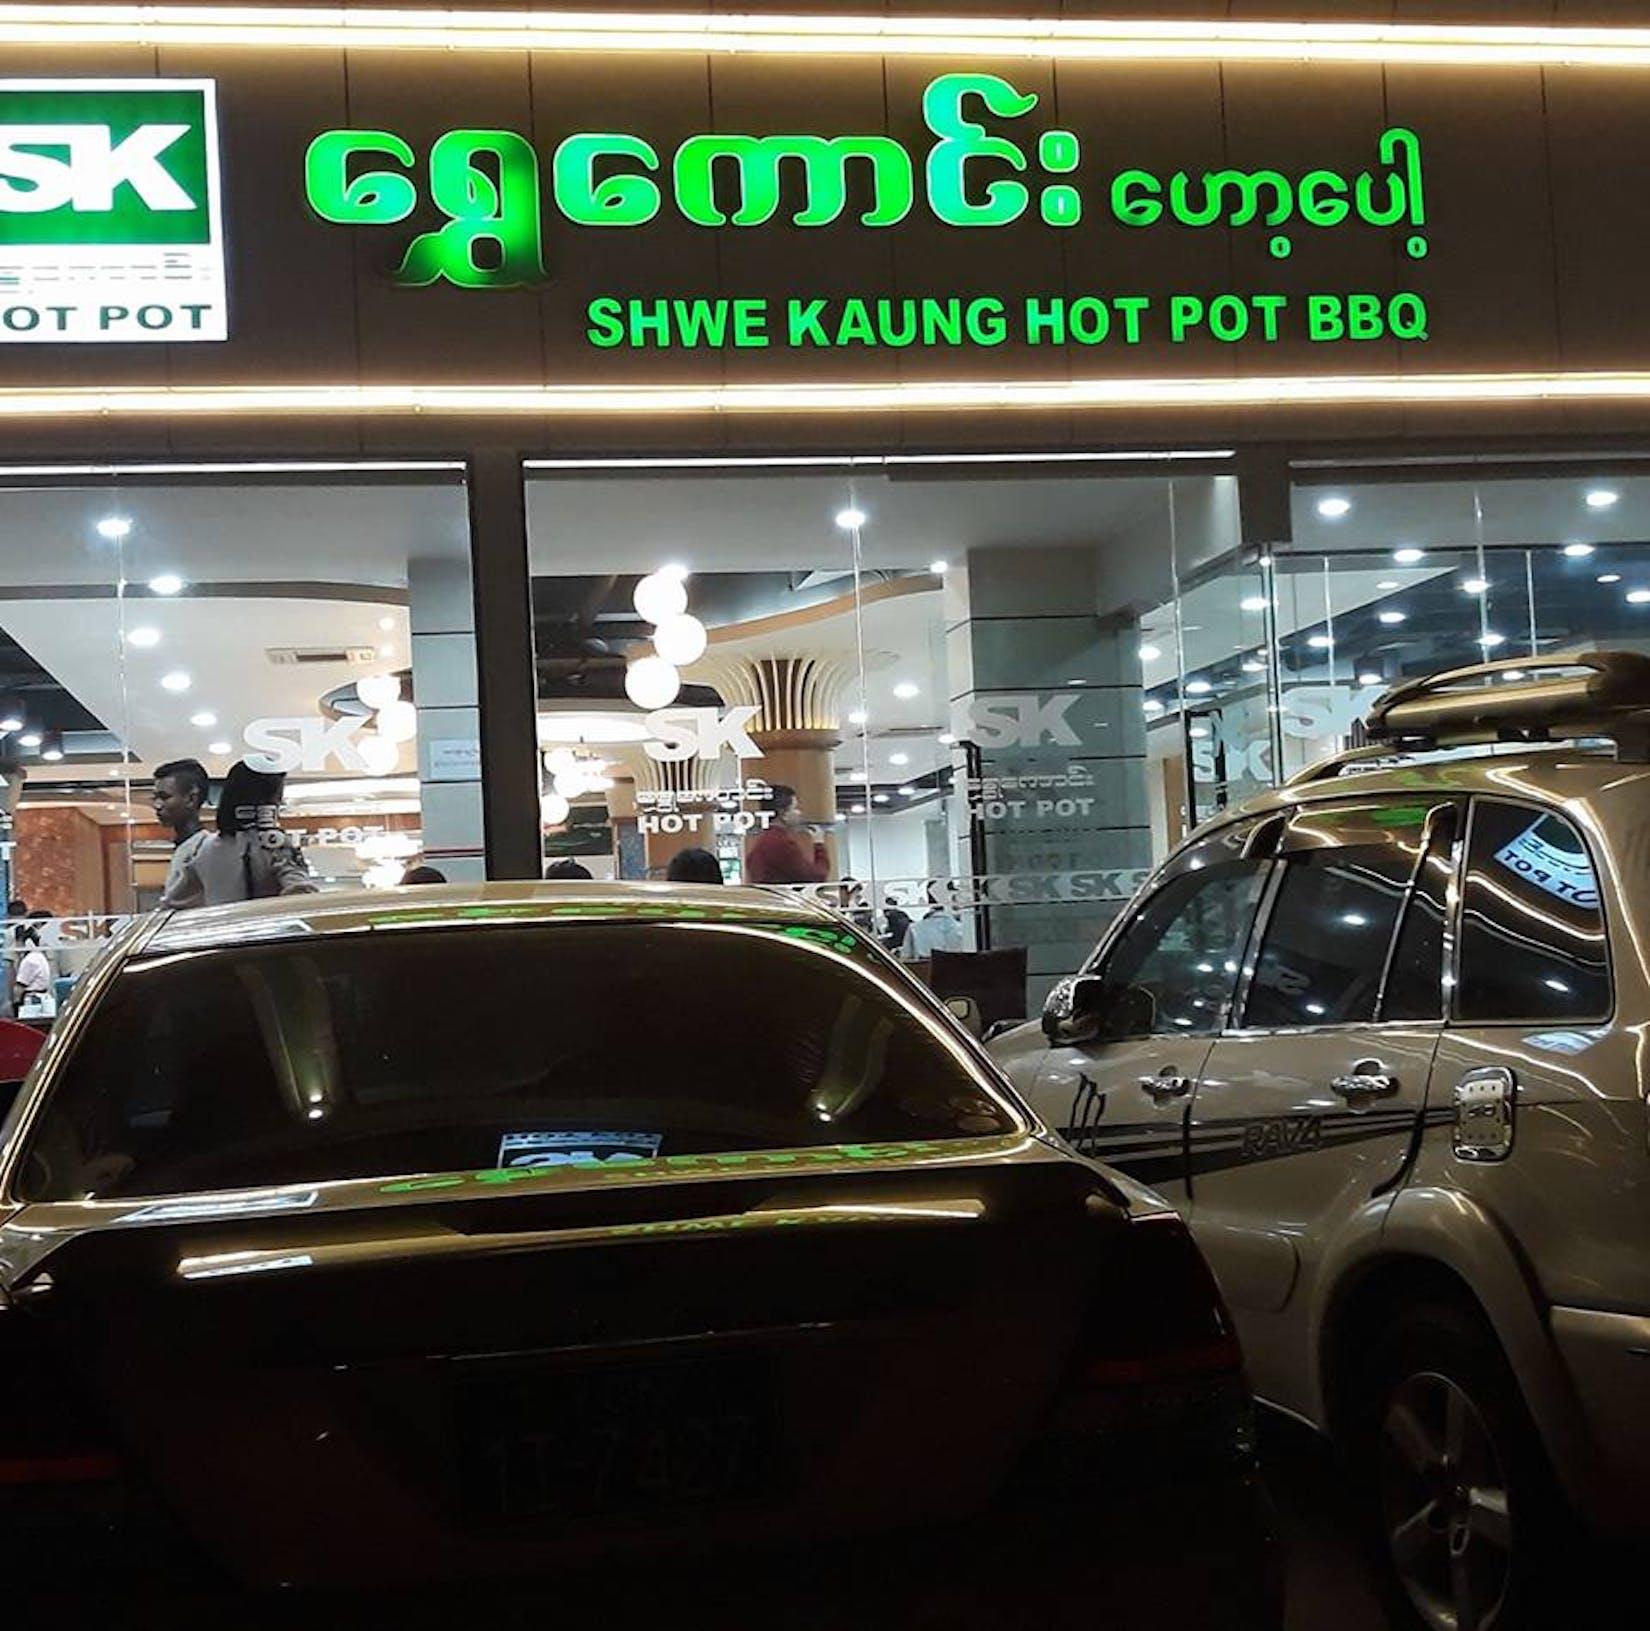 Shwe Kaung Hot Pot (shwe gone dine) | yathar